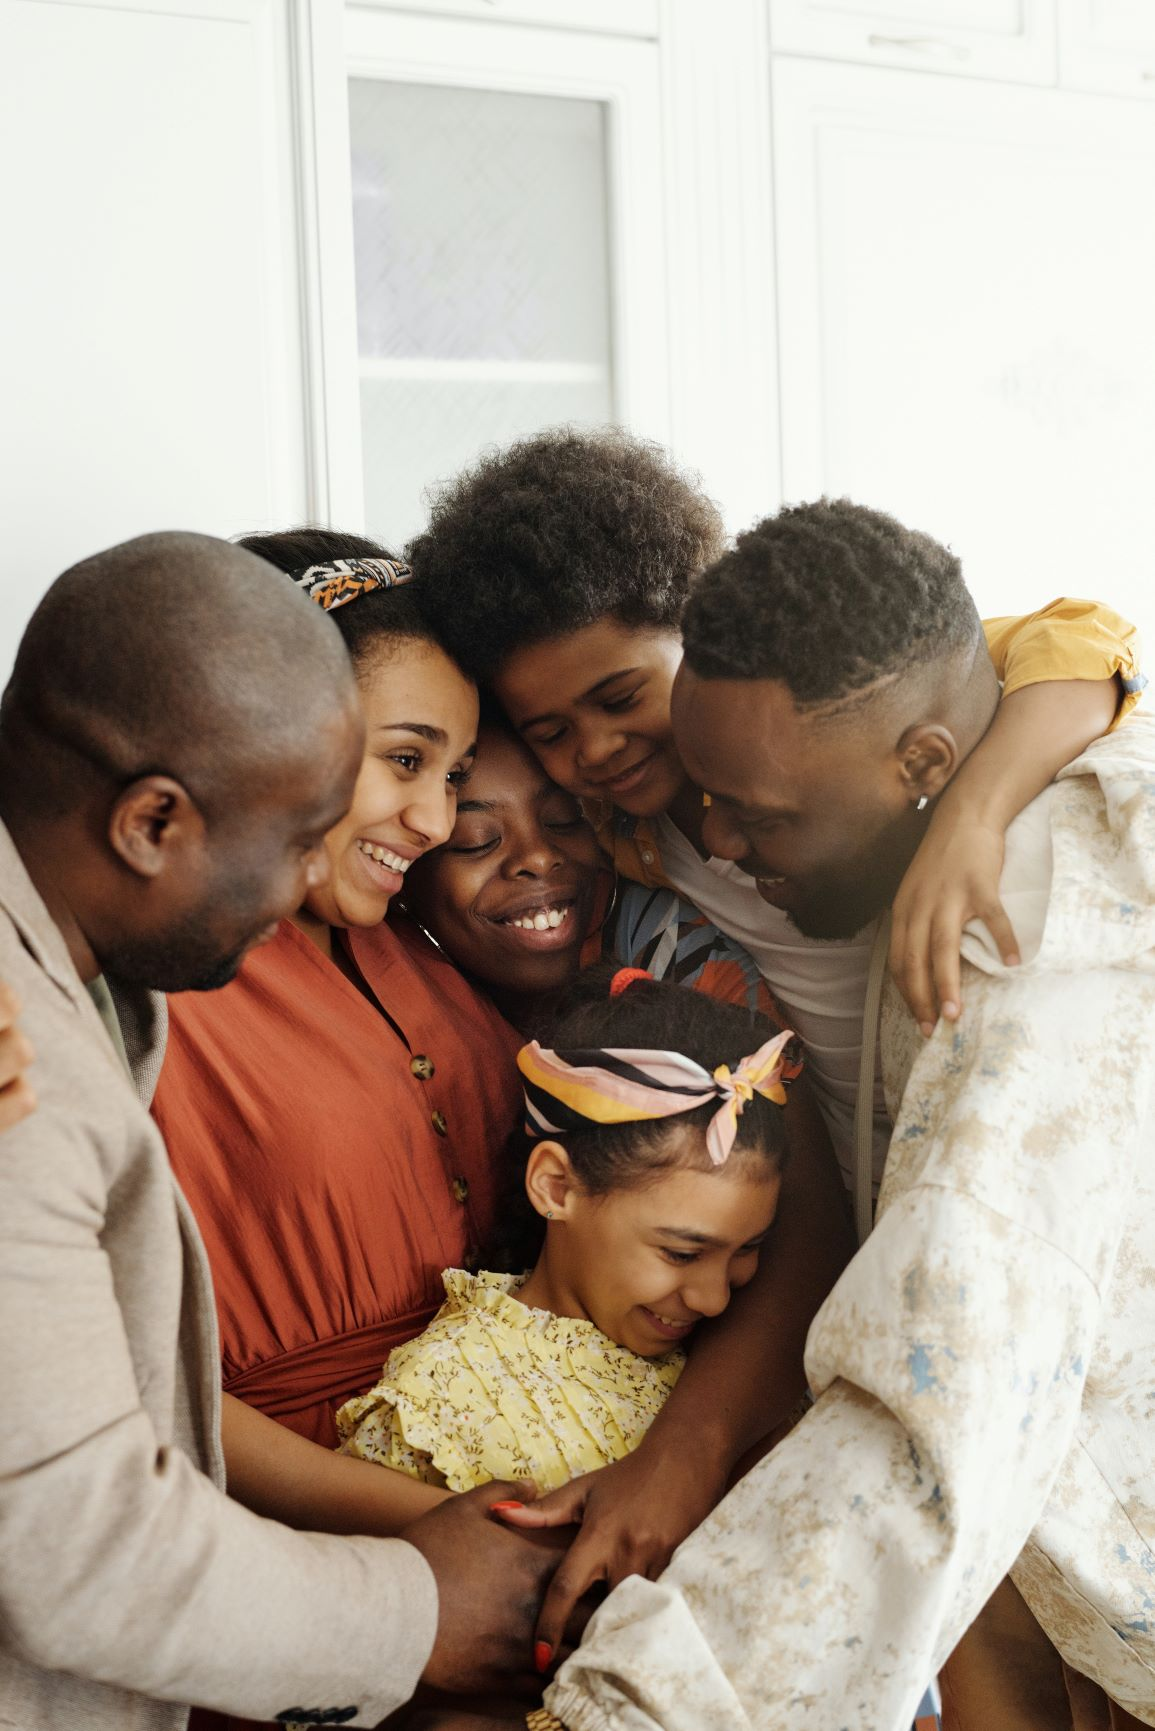 Sociologija porodice